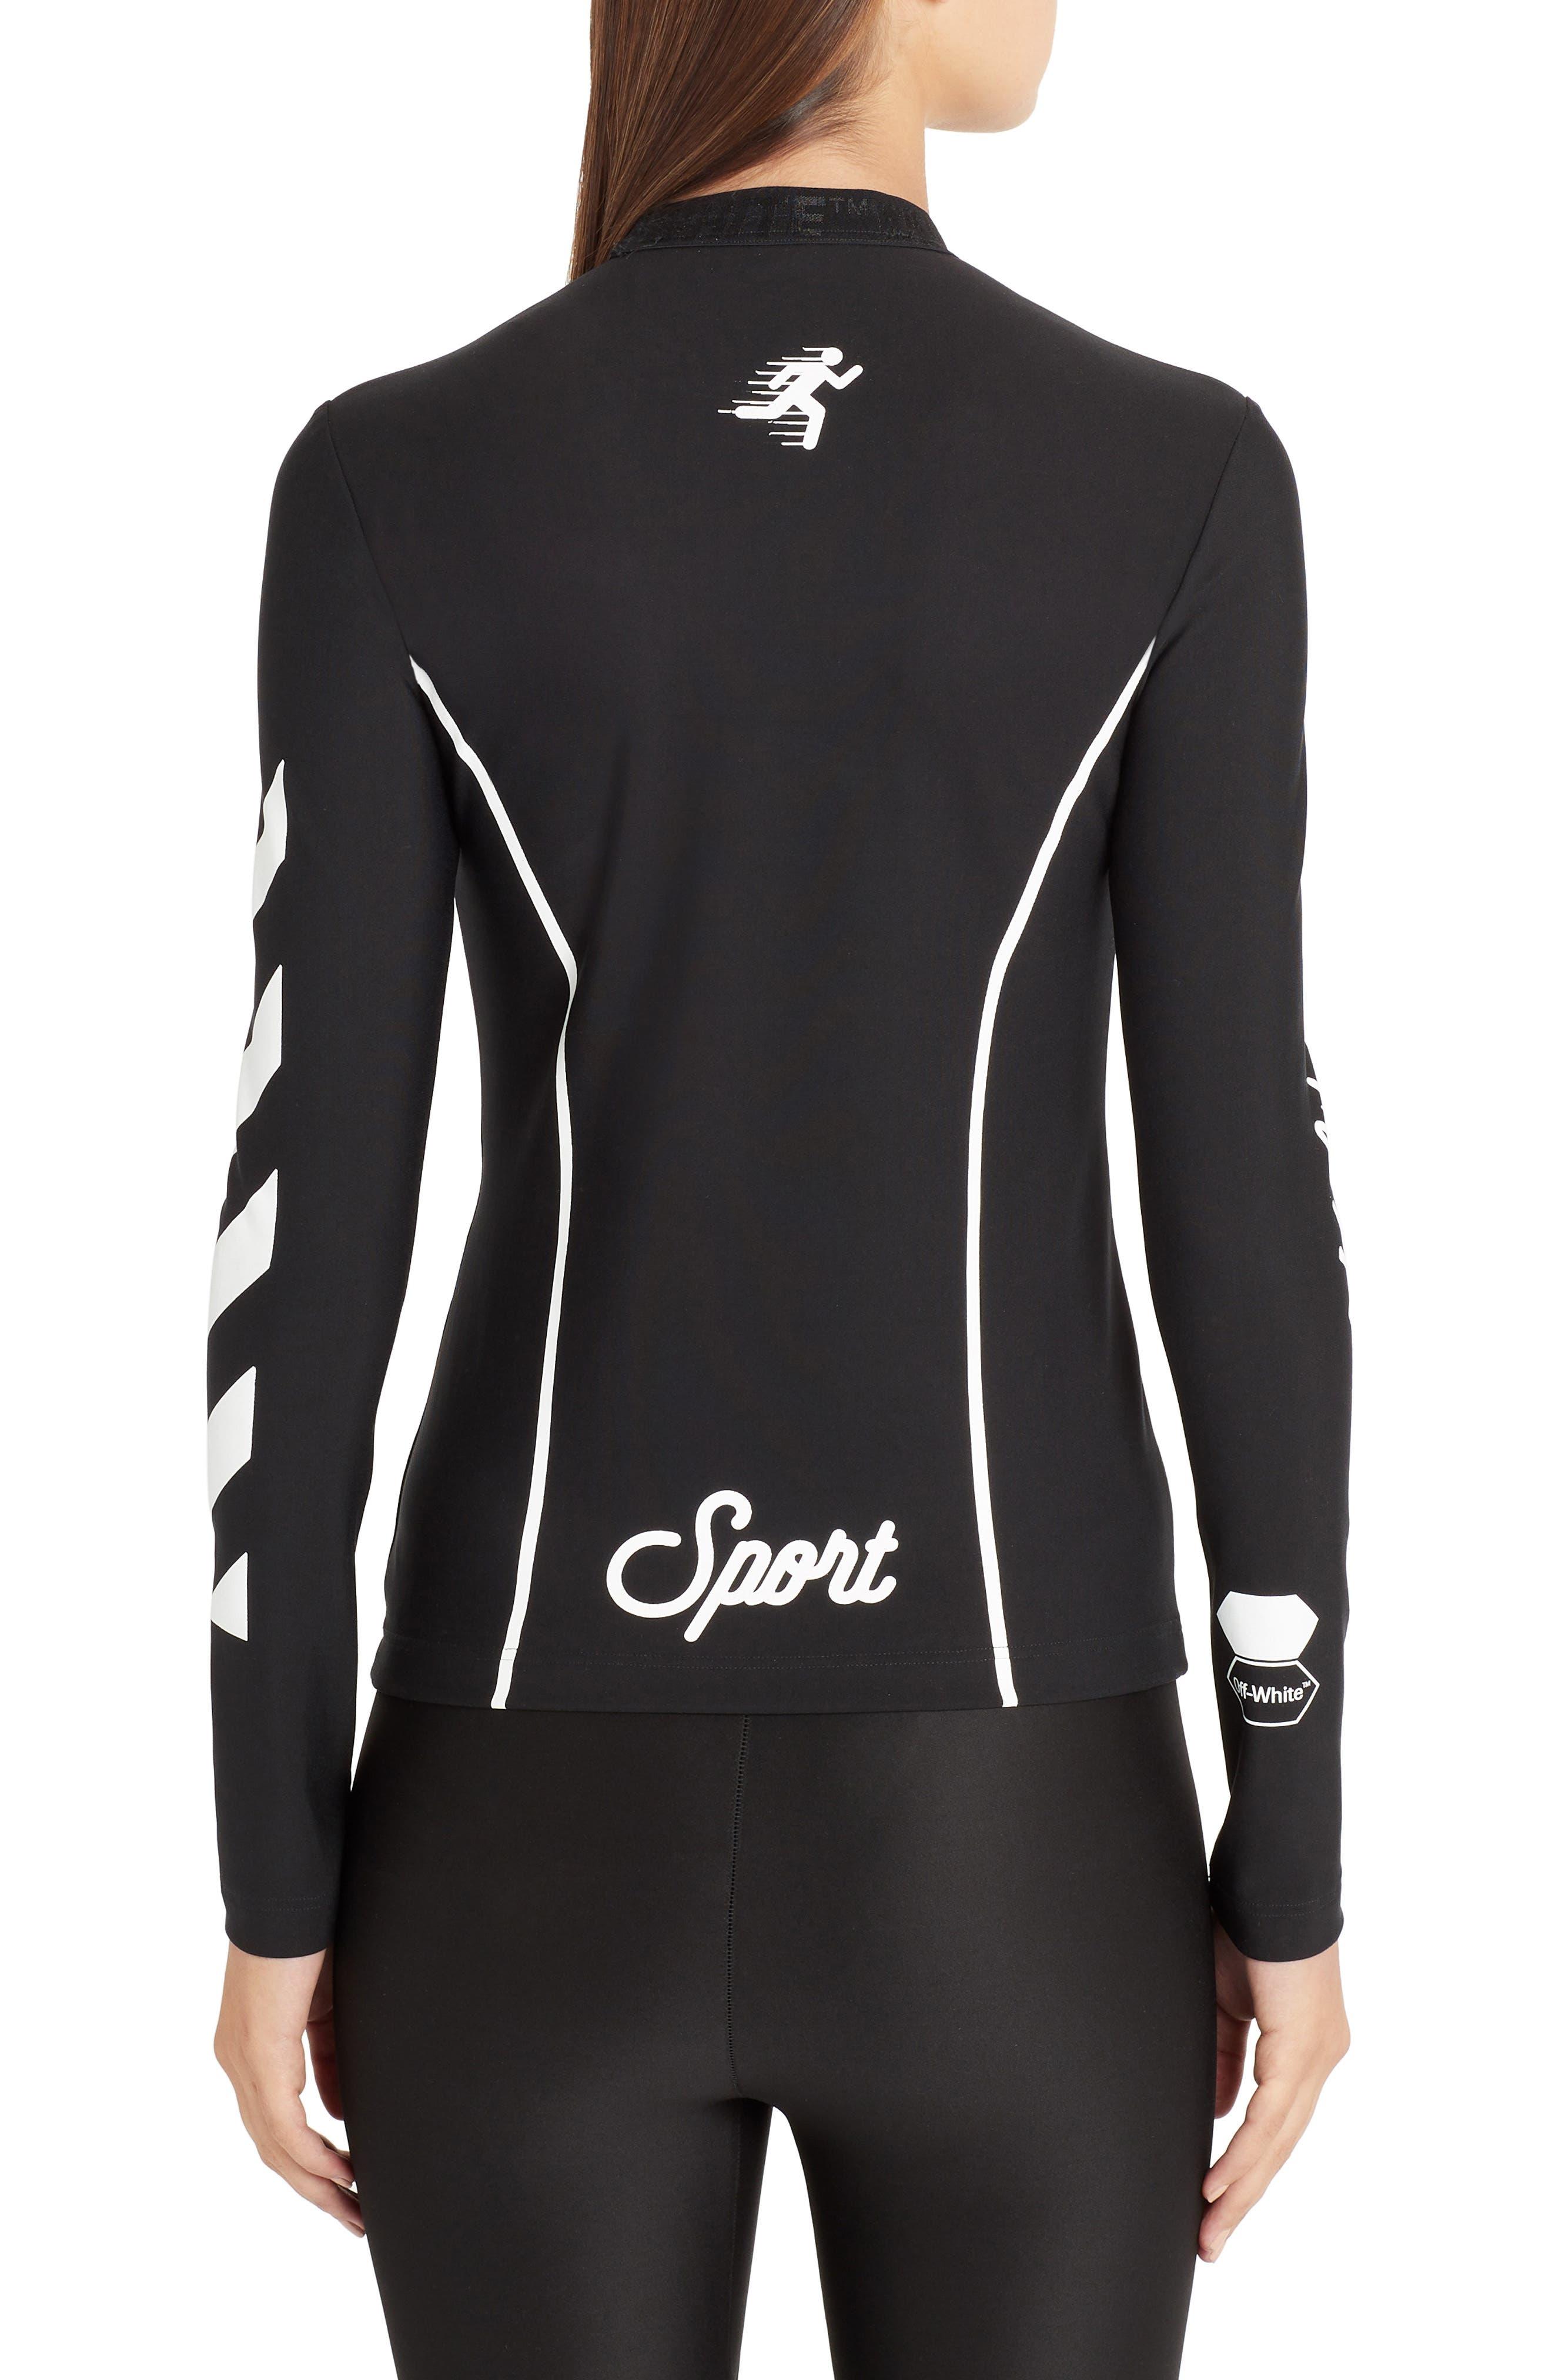 OFF-WHITE, Diagonal Stripe Sport Top, Alternate thumbnail 2, color, BLACK WHITE